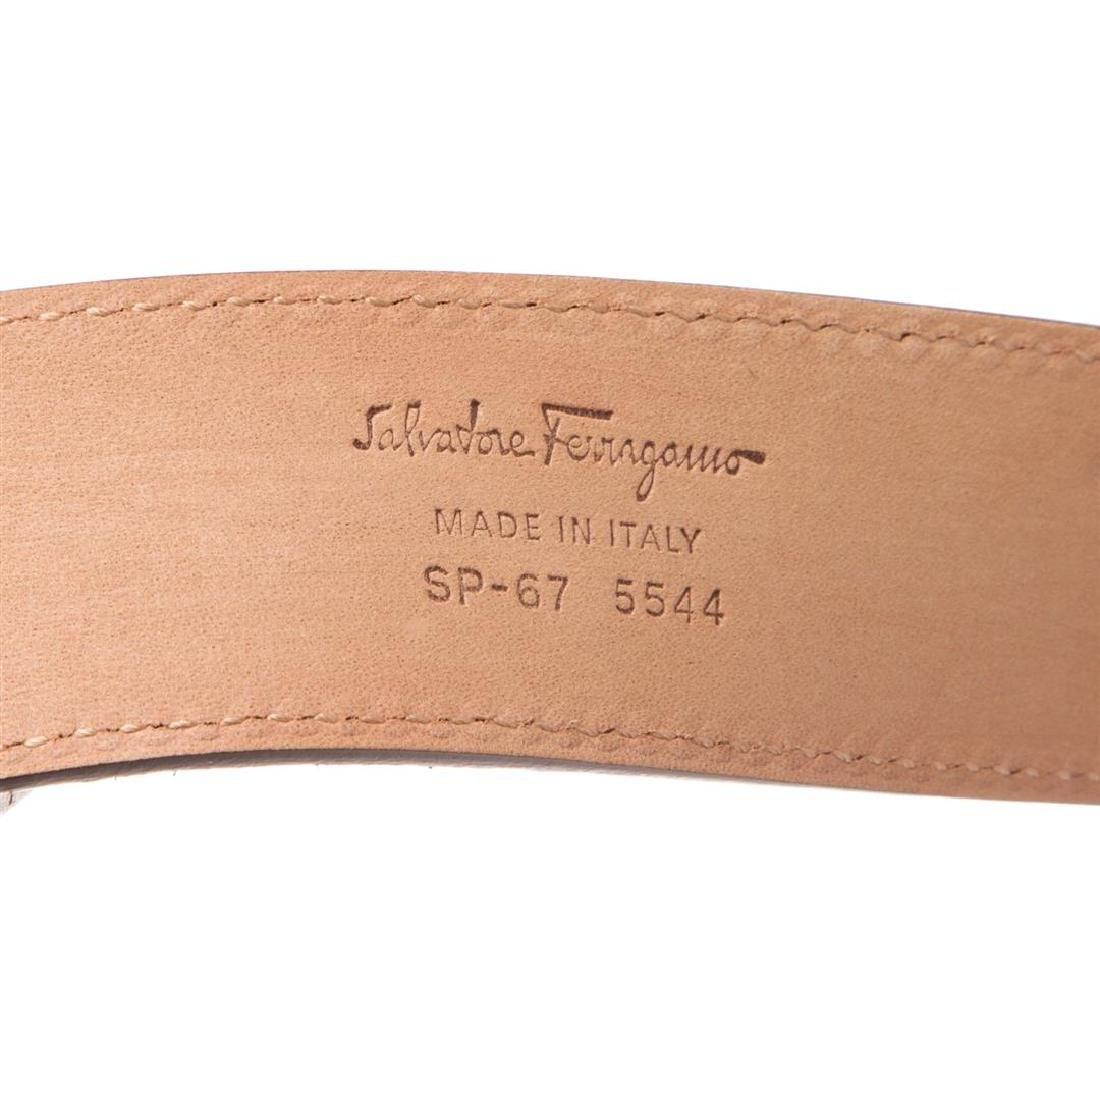 Salvatore Ferragamo Gancini Brown Leather Belt - 7